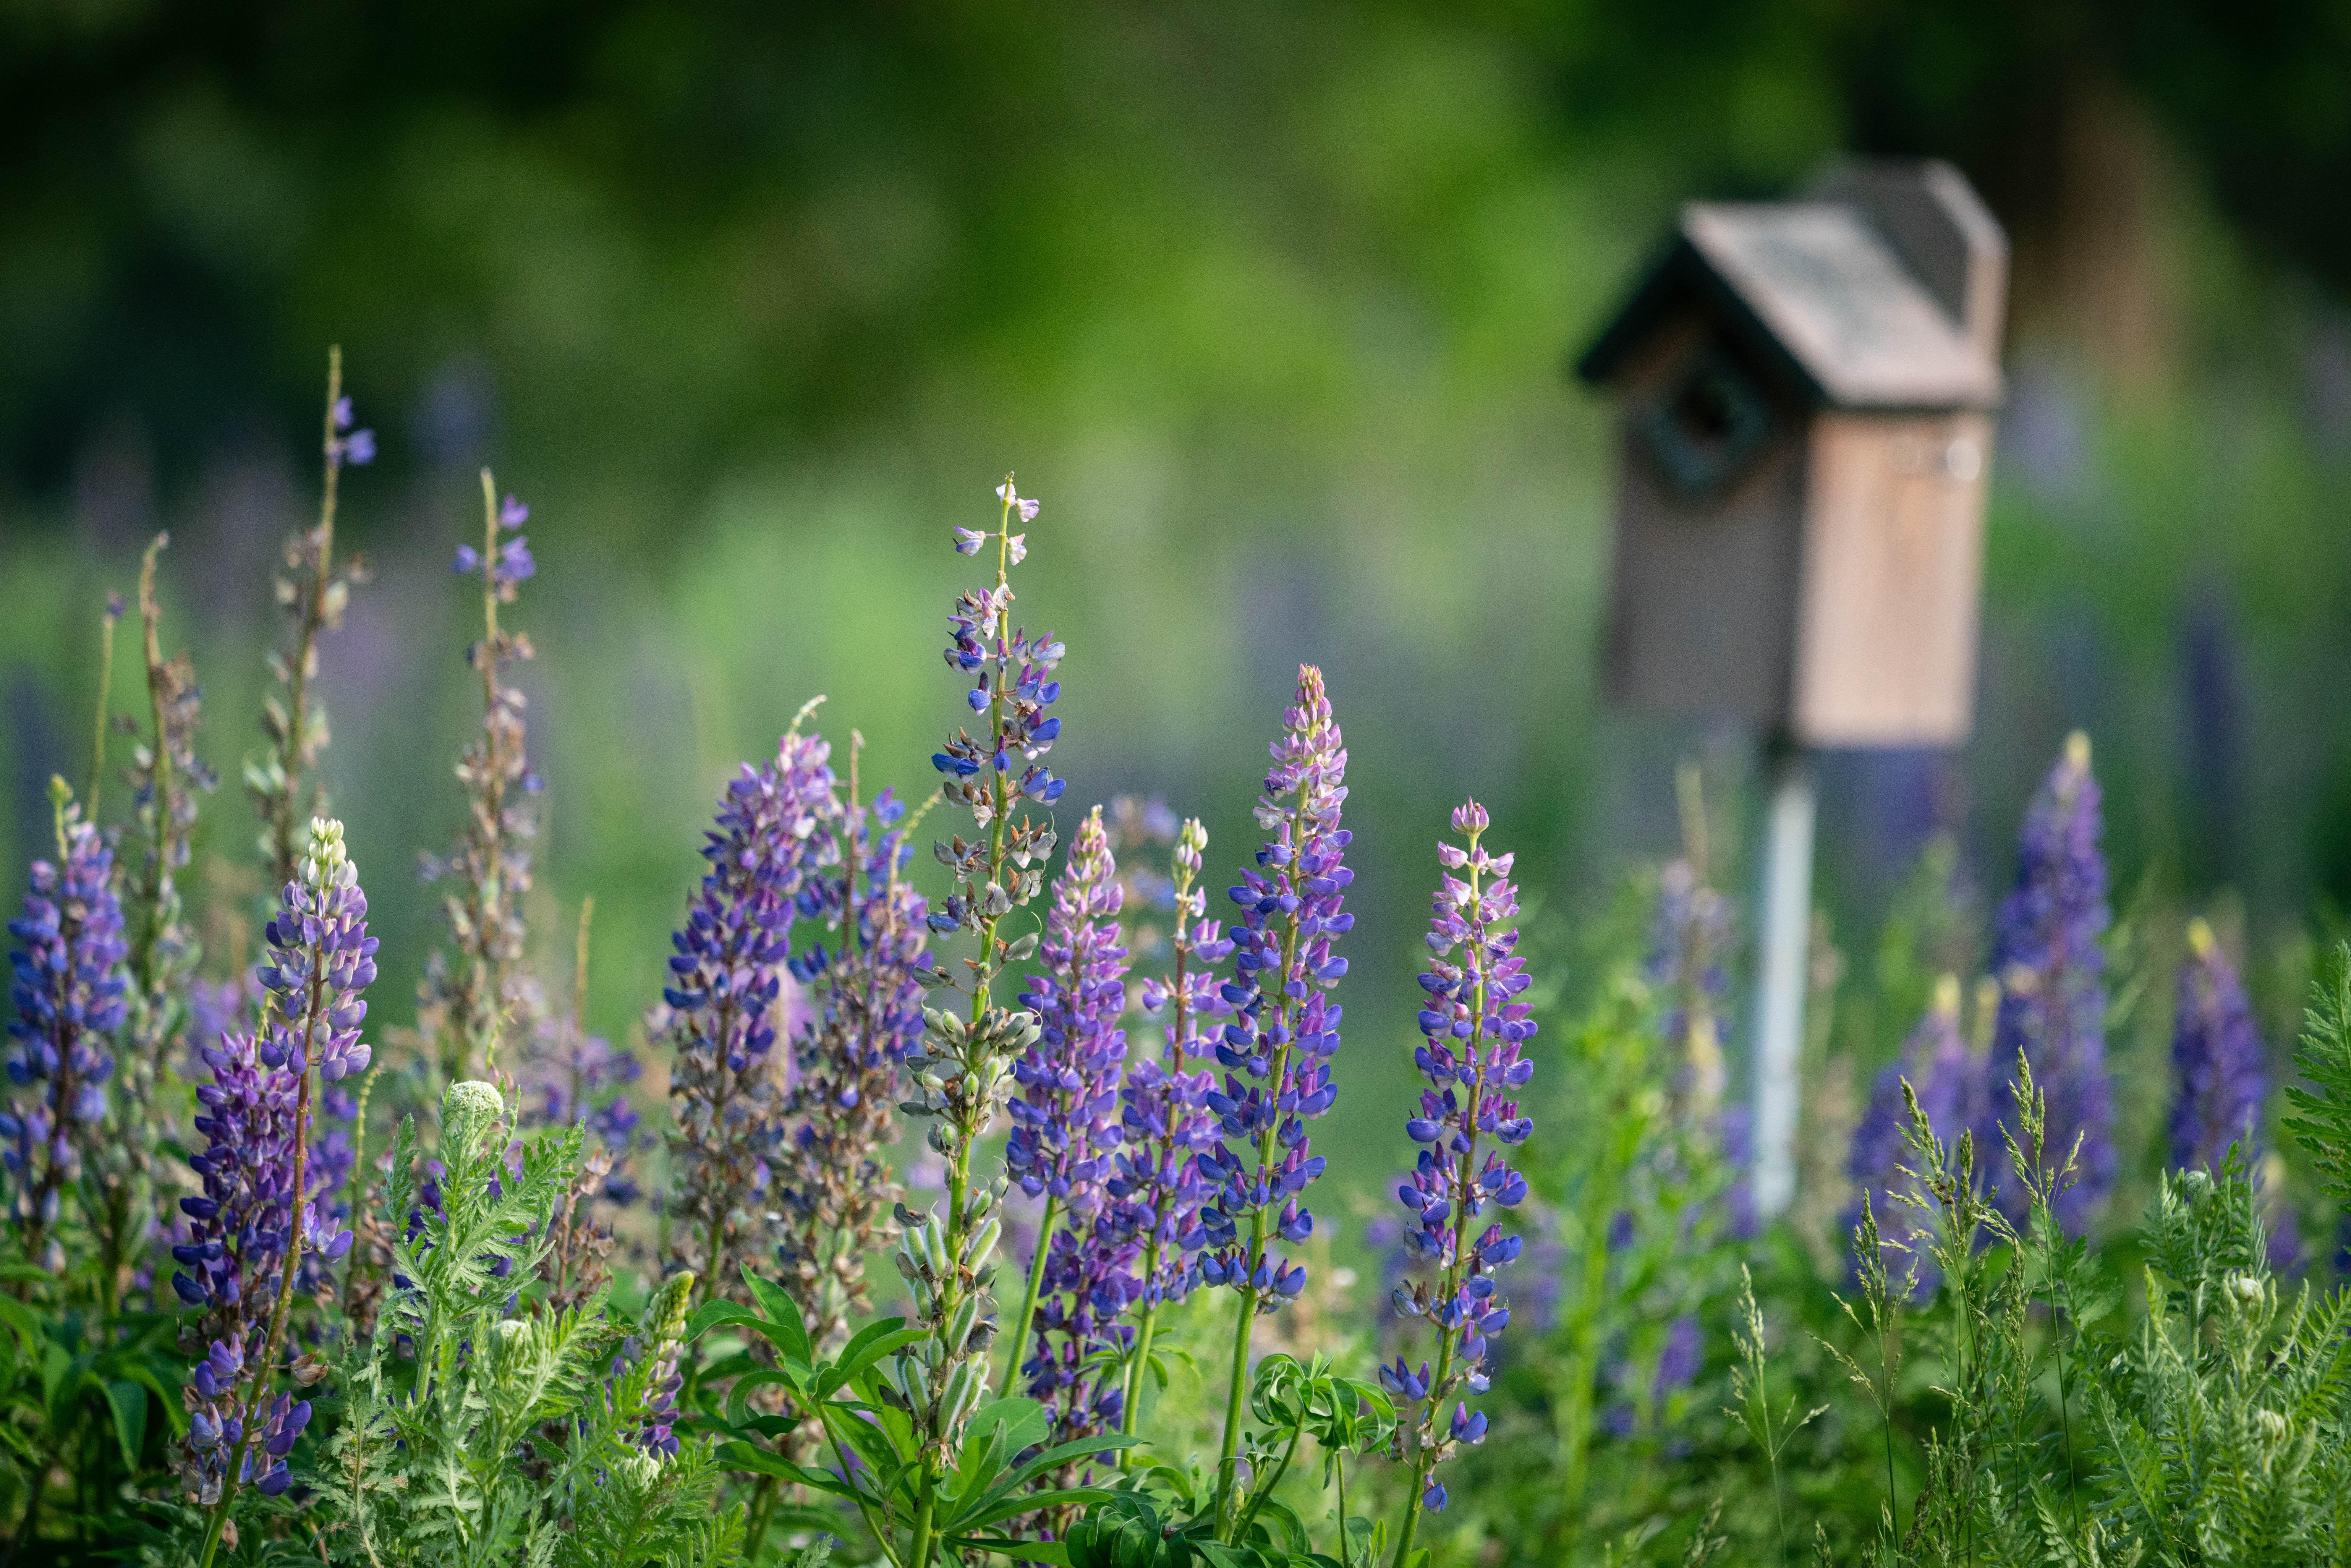 #lupine, #birdhouse, #meadow, #garden, #erika, #pennsylvania, #sewickley